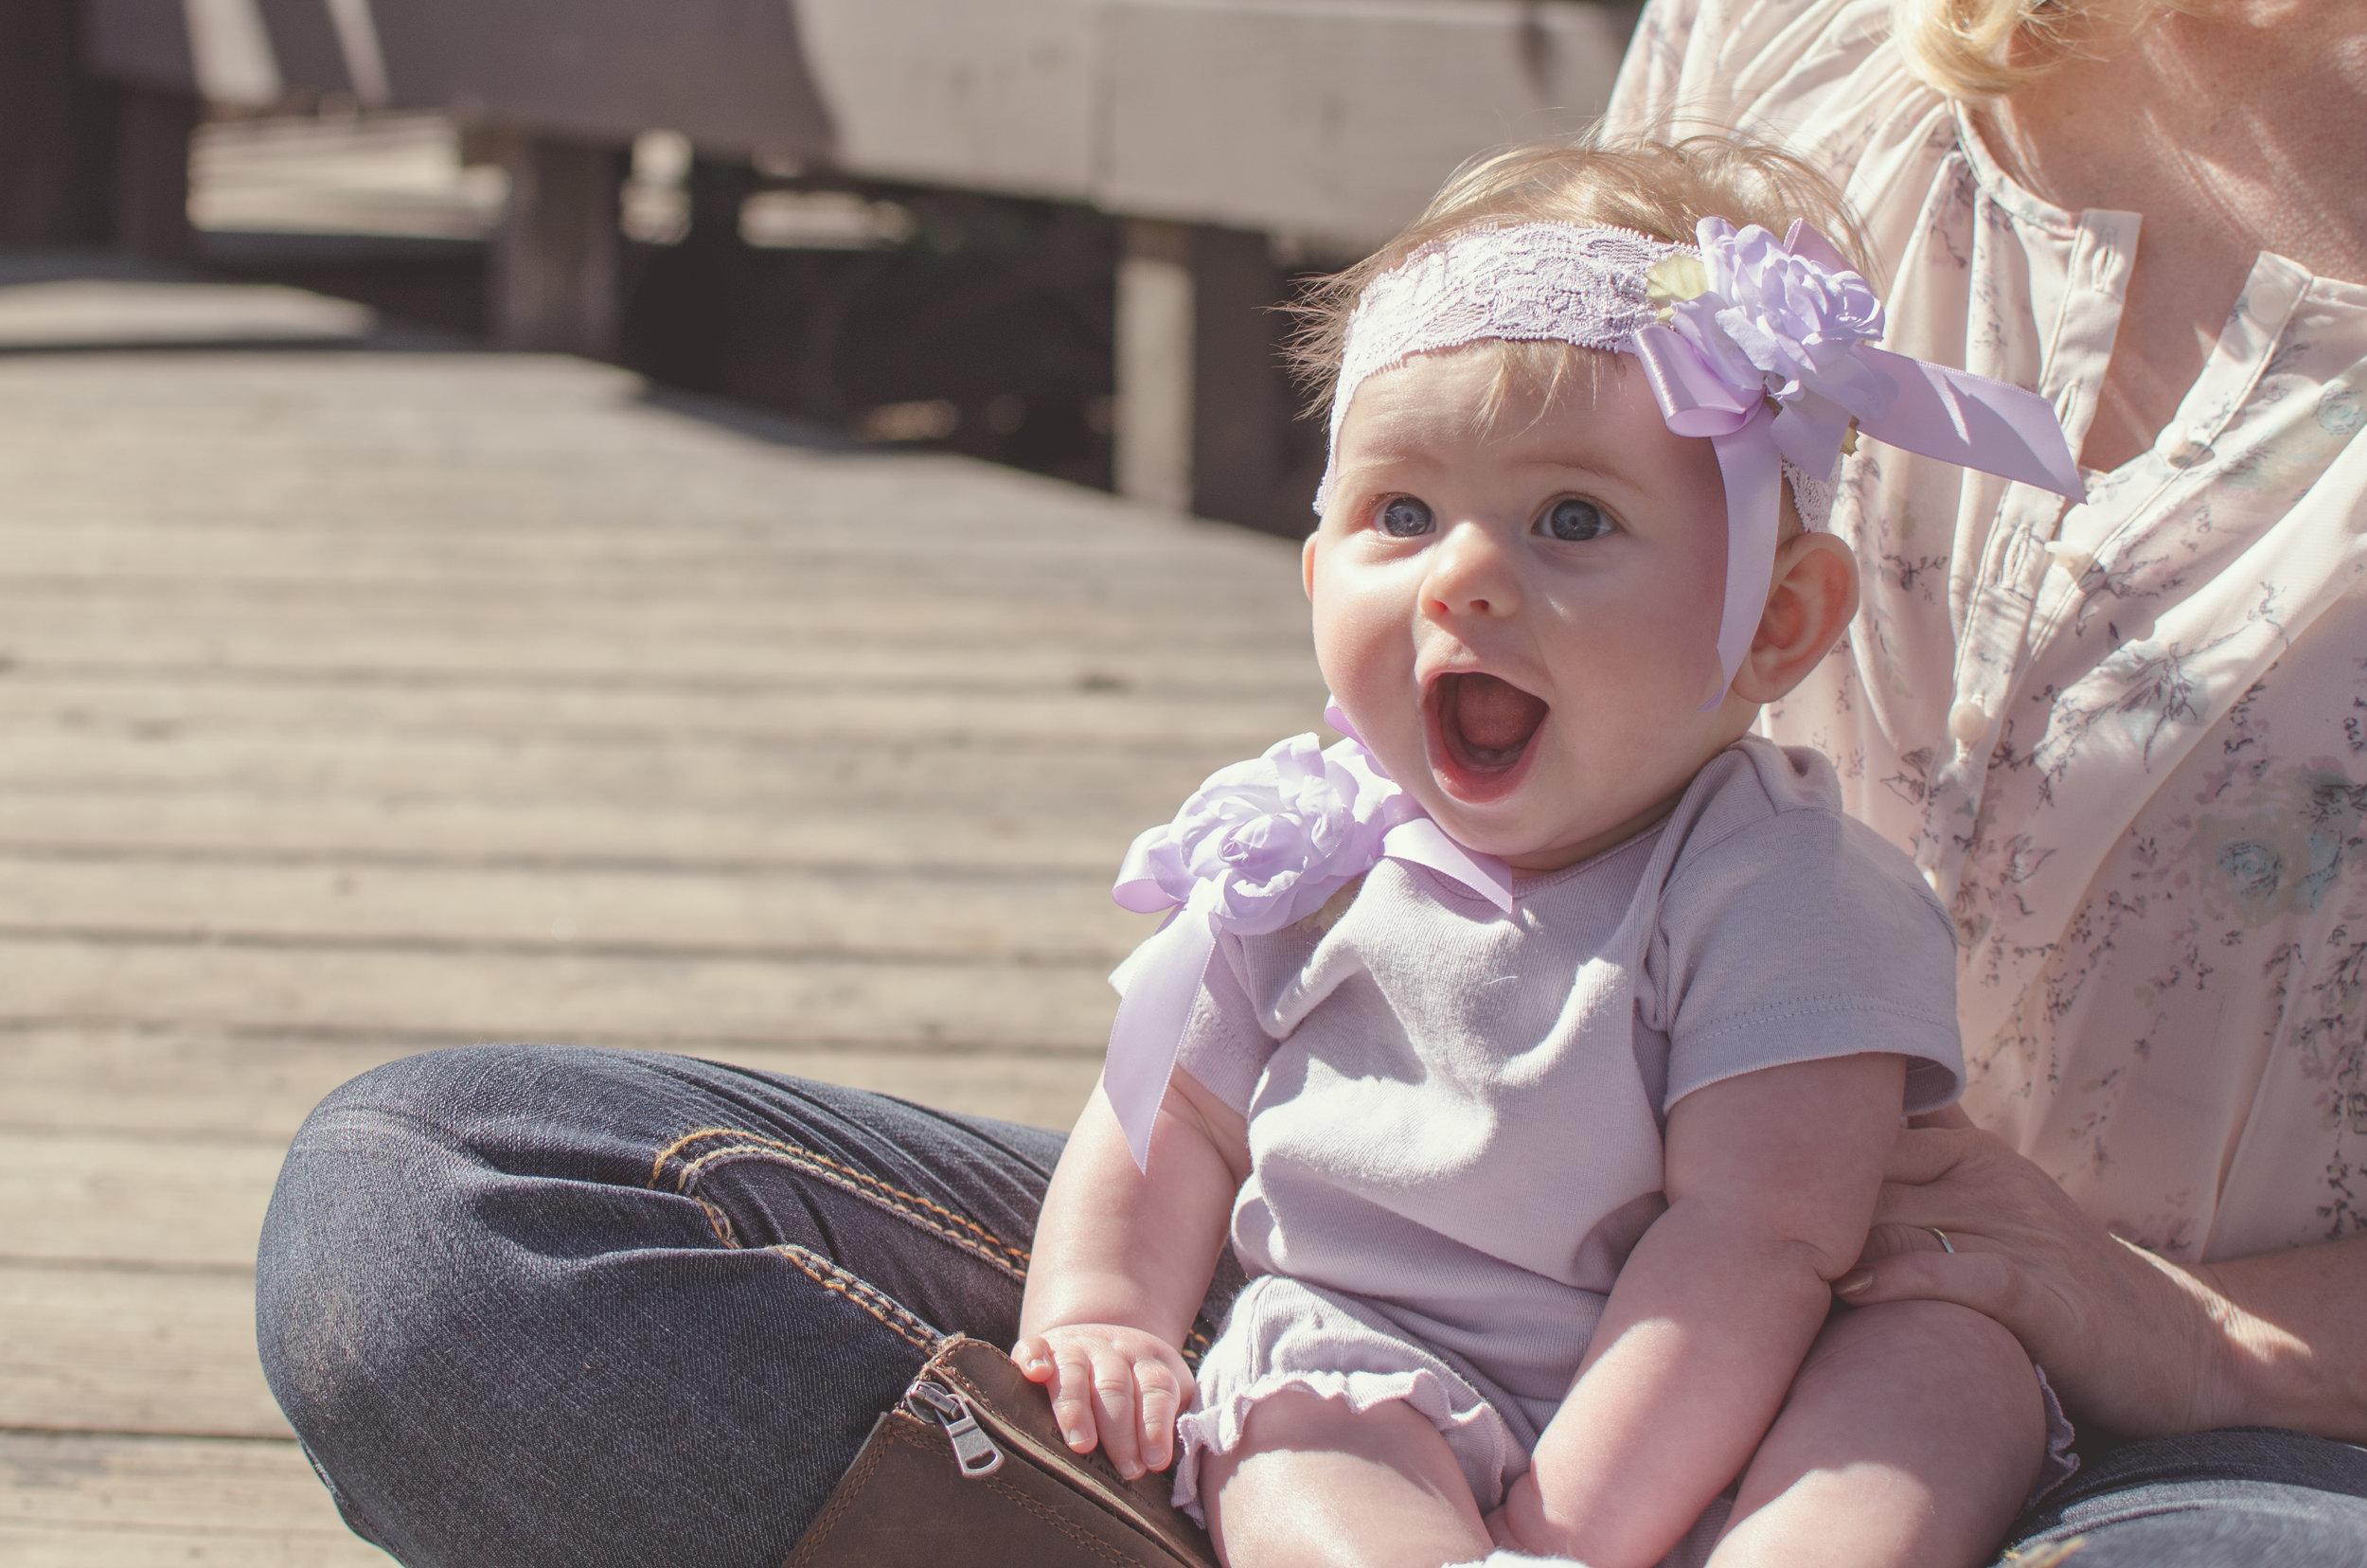 Surprised and happy kiddo, breastfeeding